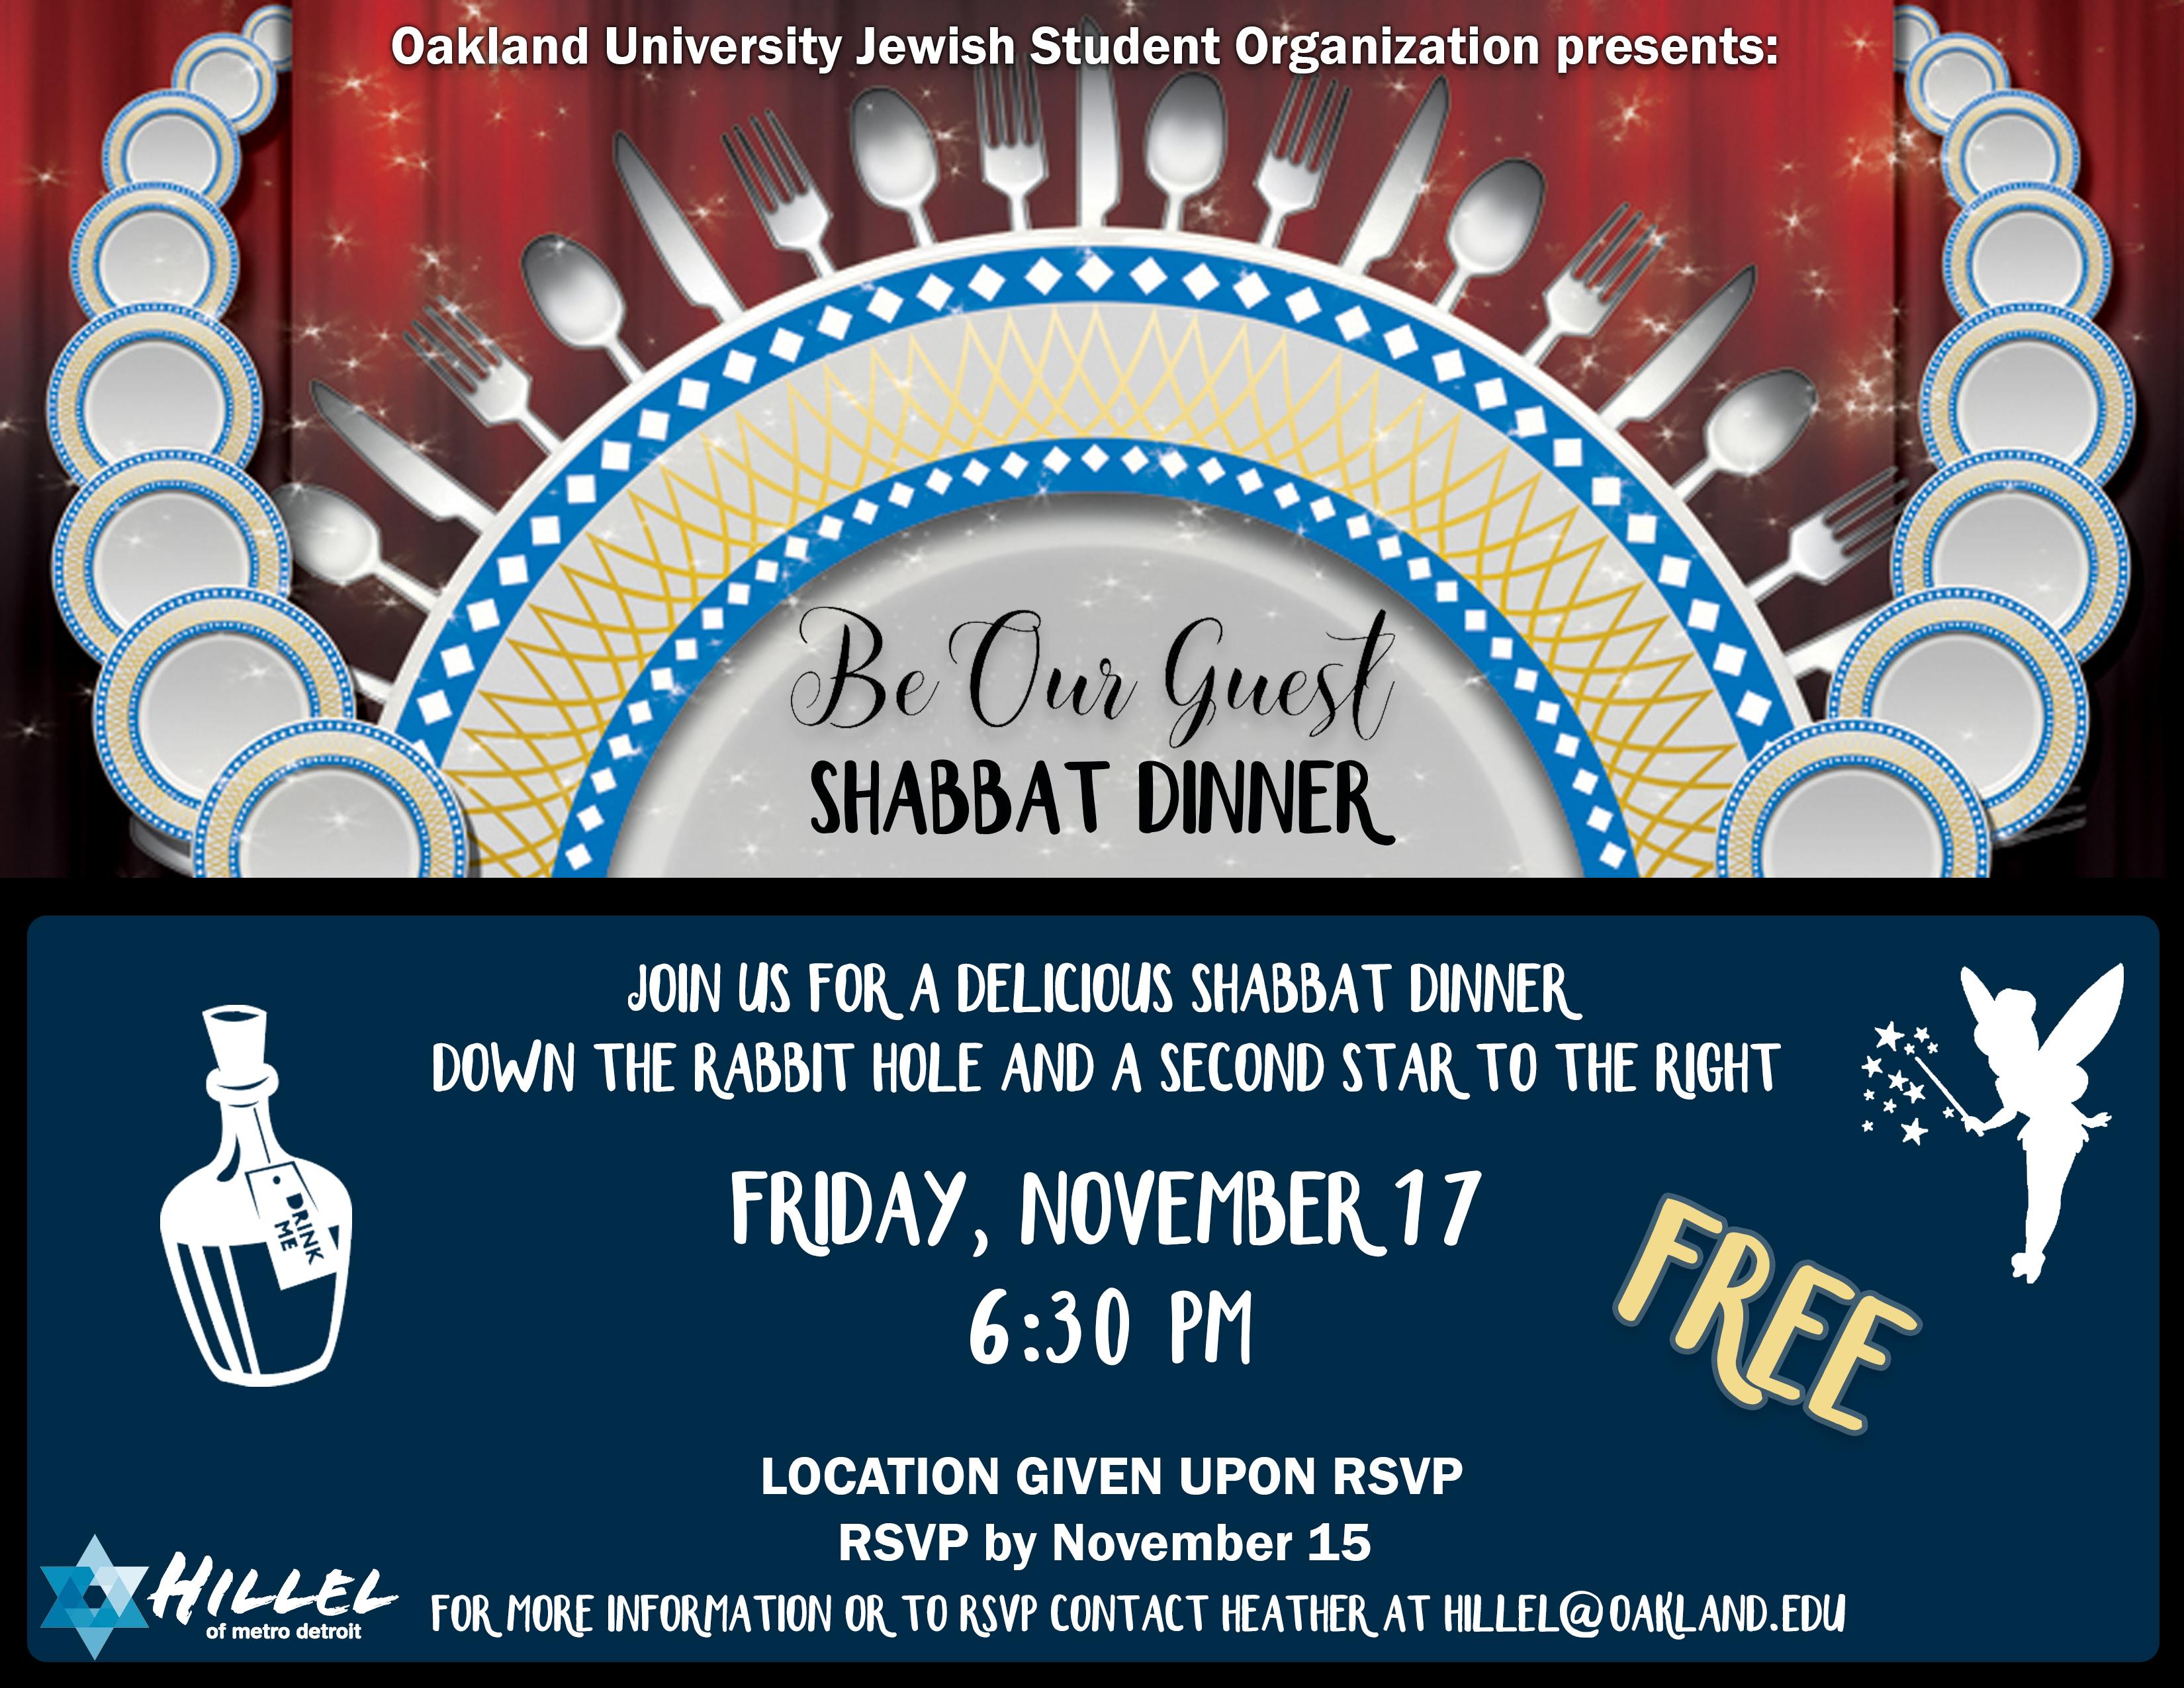 OU Shabbat Dinner 2017 fall